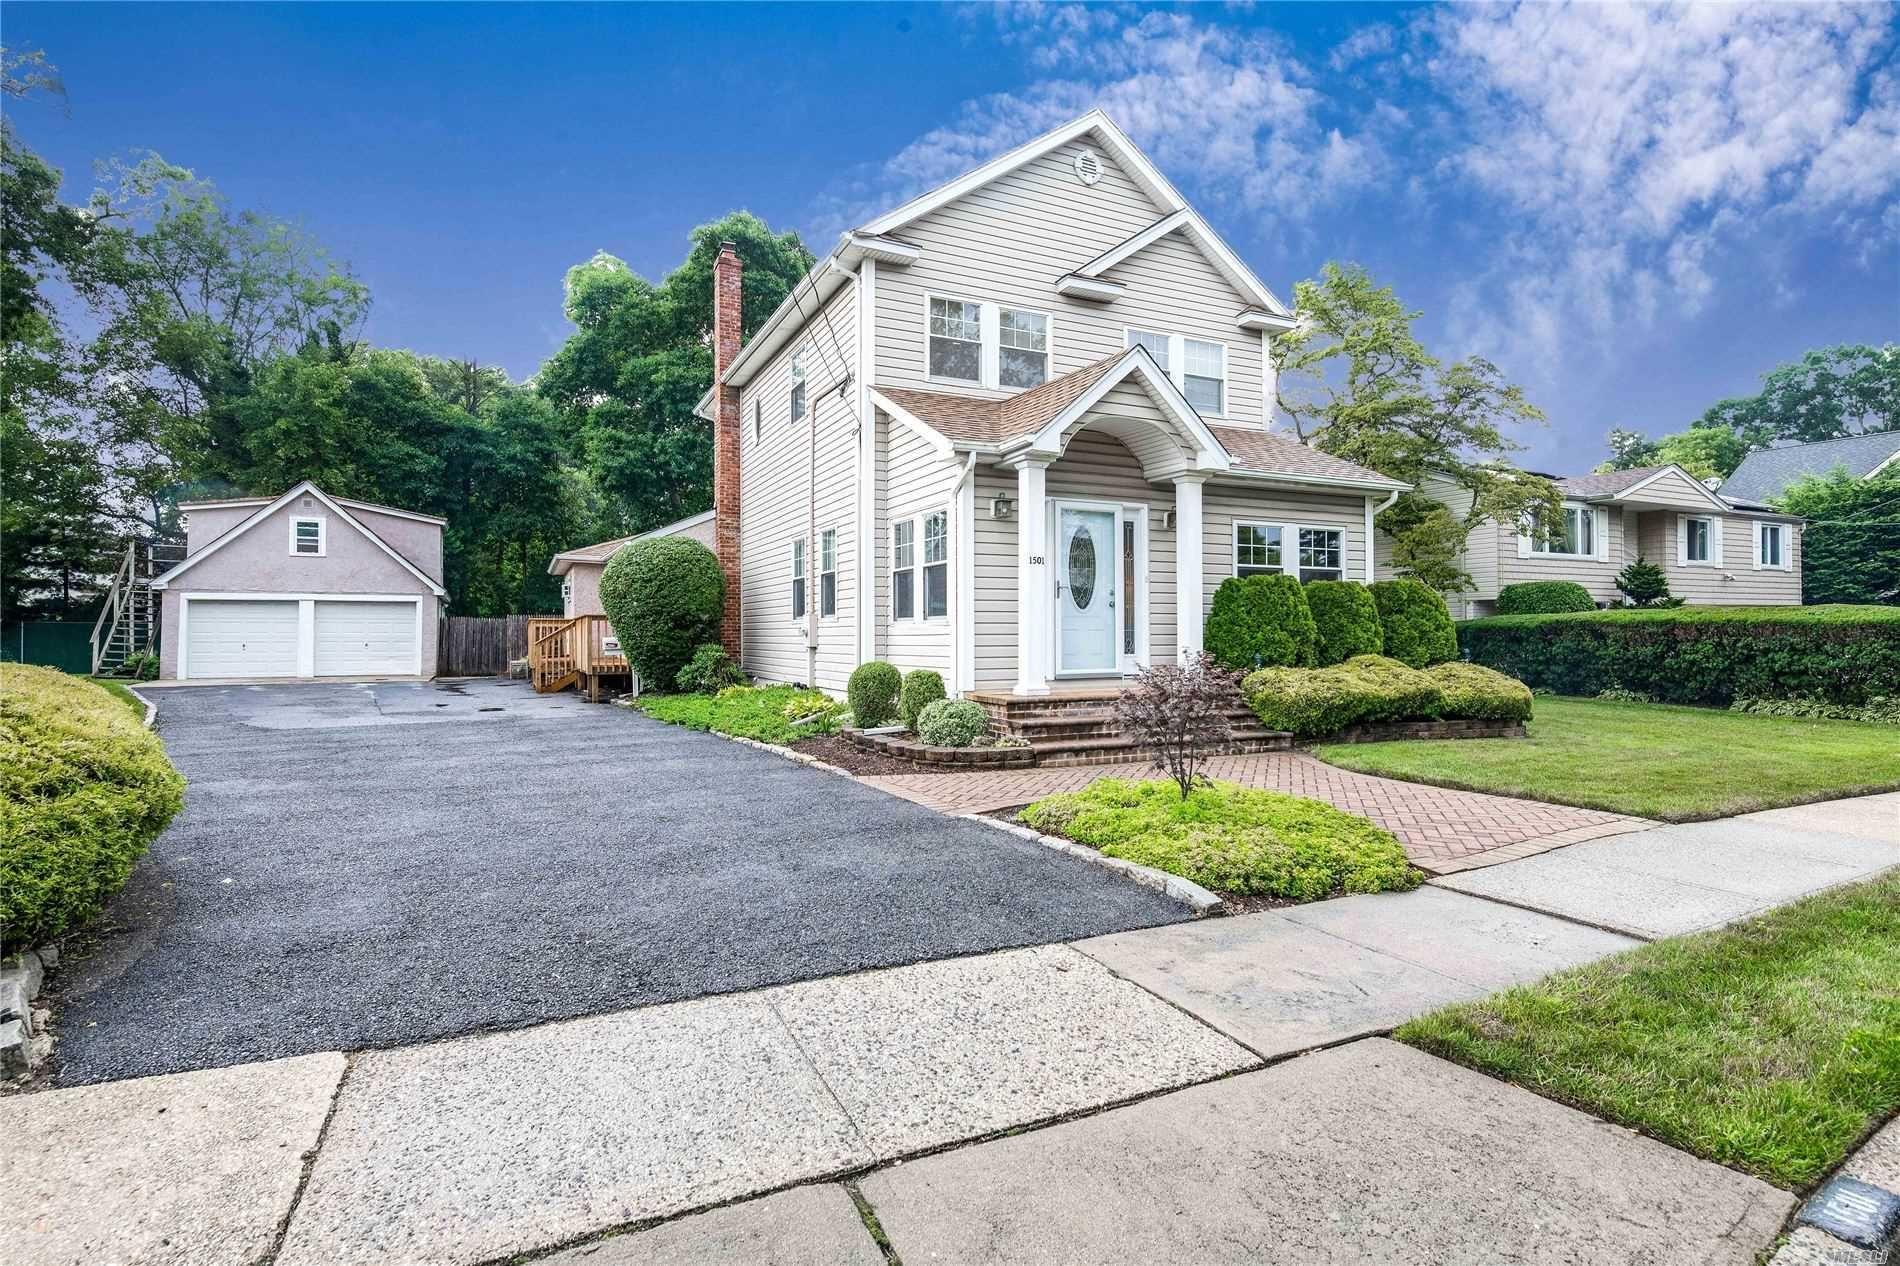 1501 William St, Merrick, NY 11566 - MLS#: 3236165